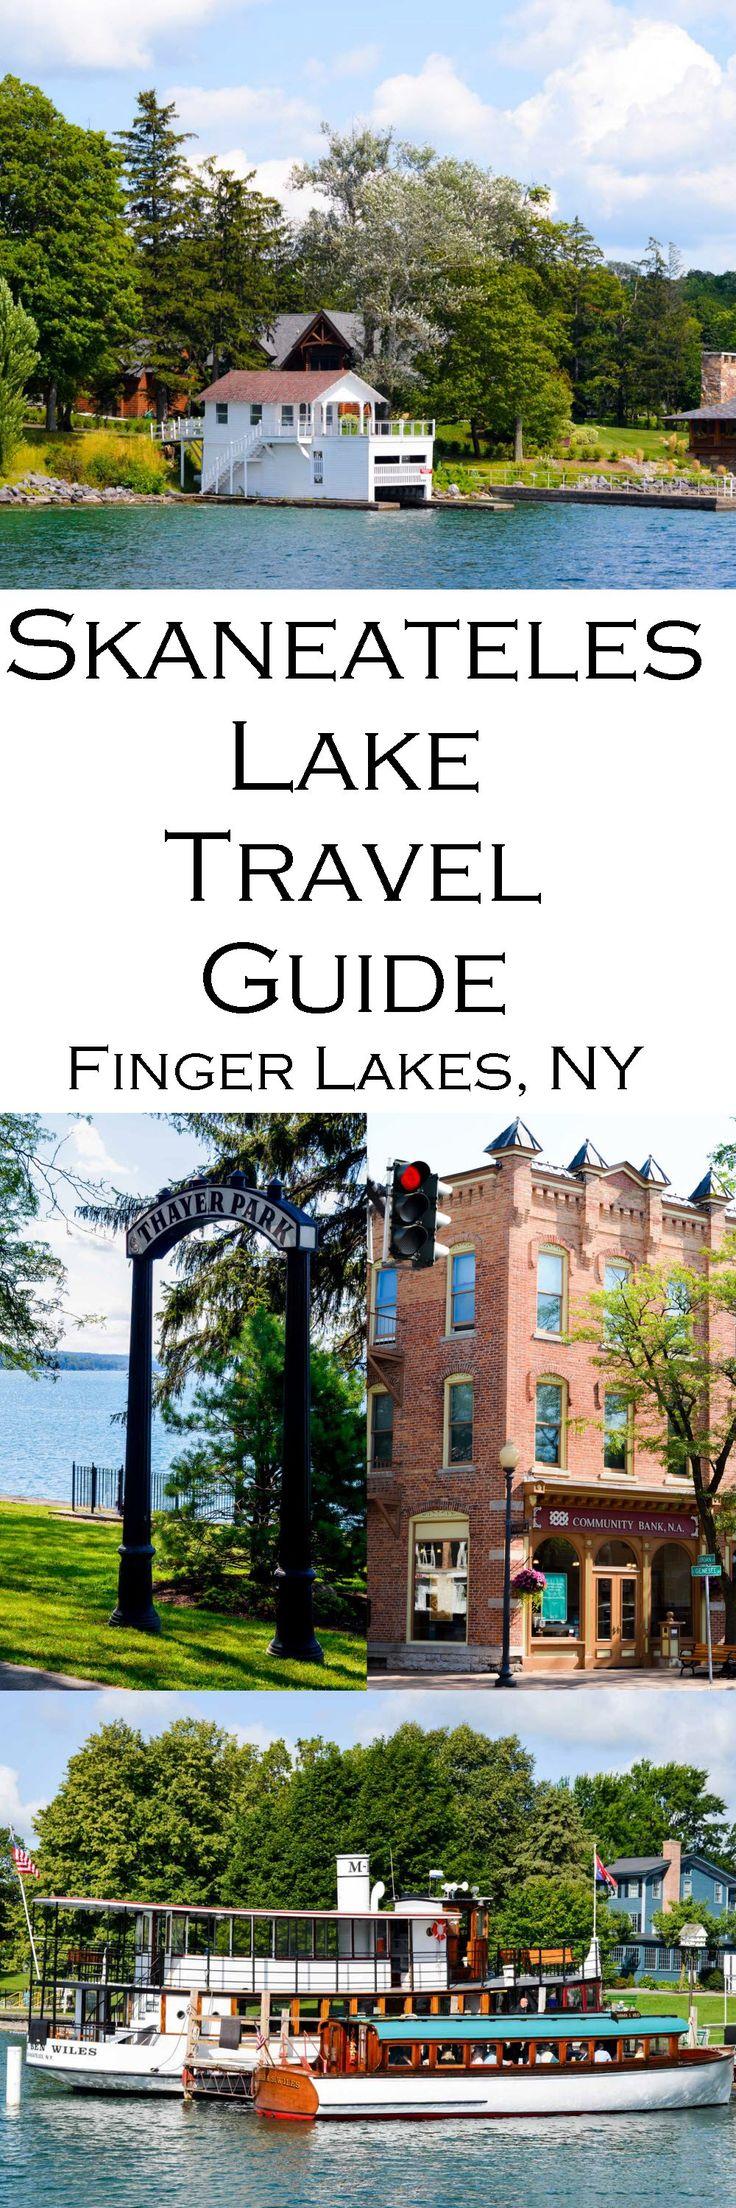 Finger lakes ny dating